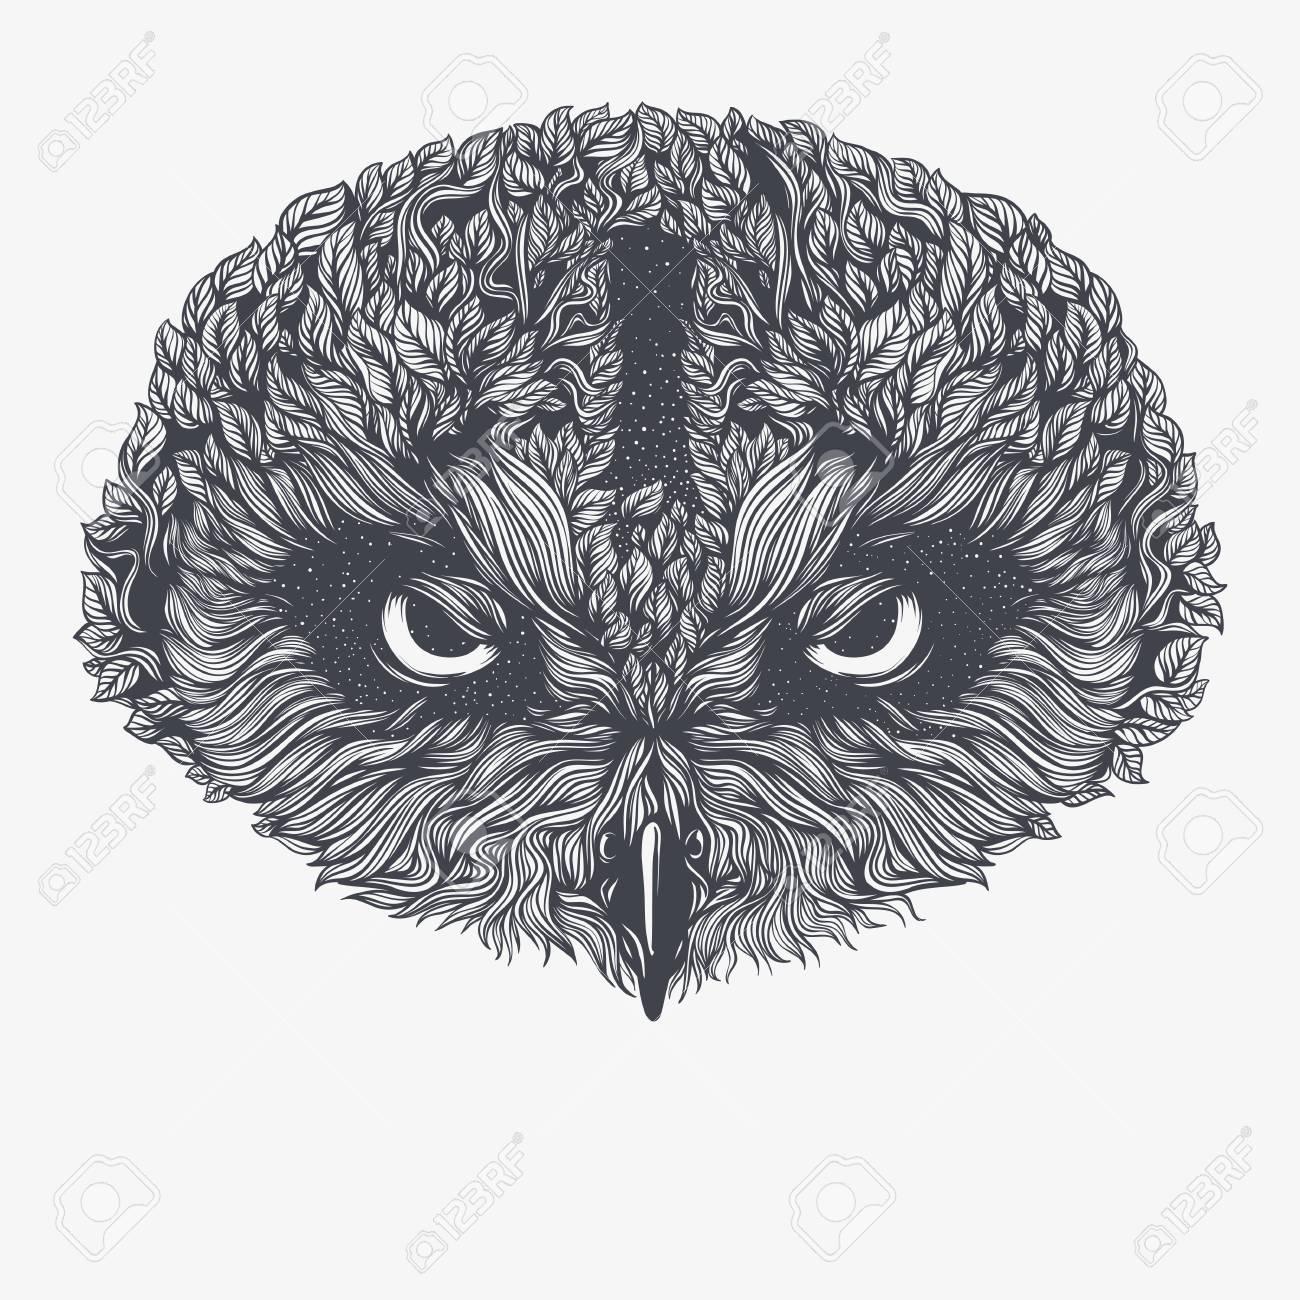 Abstract Owl. Vector Illustration Standard-Bild - 83613869